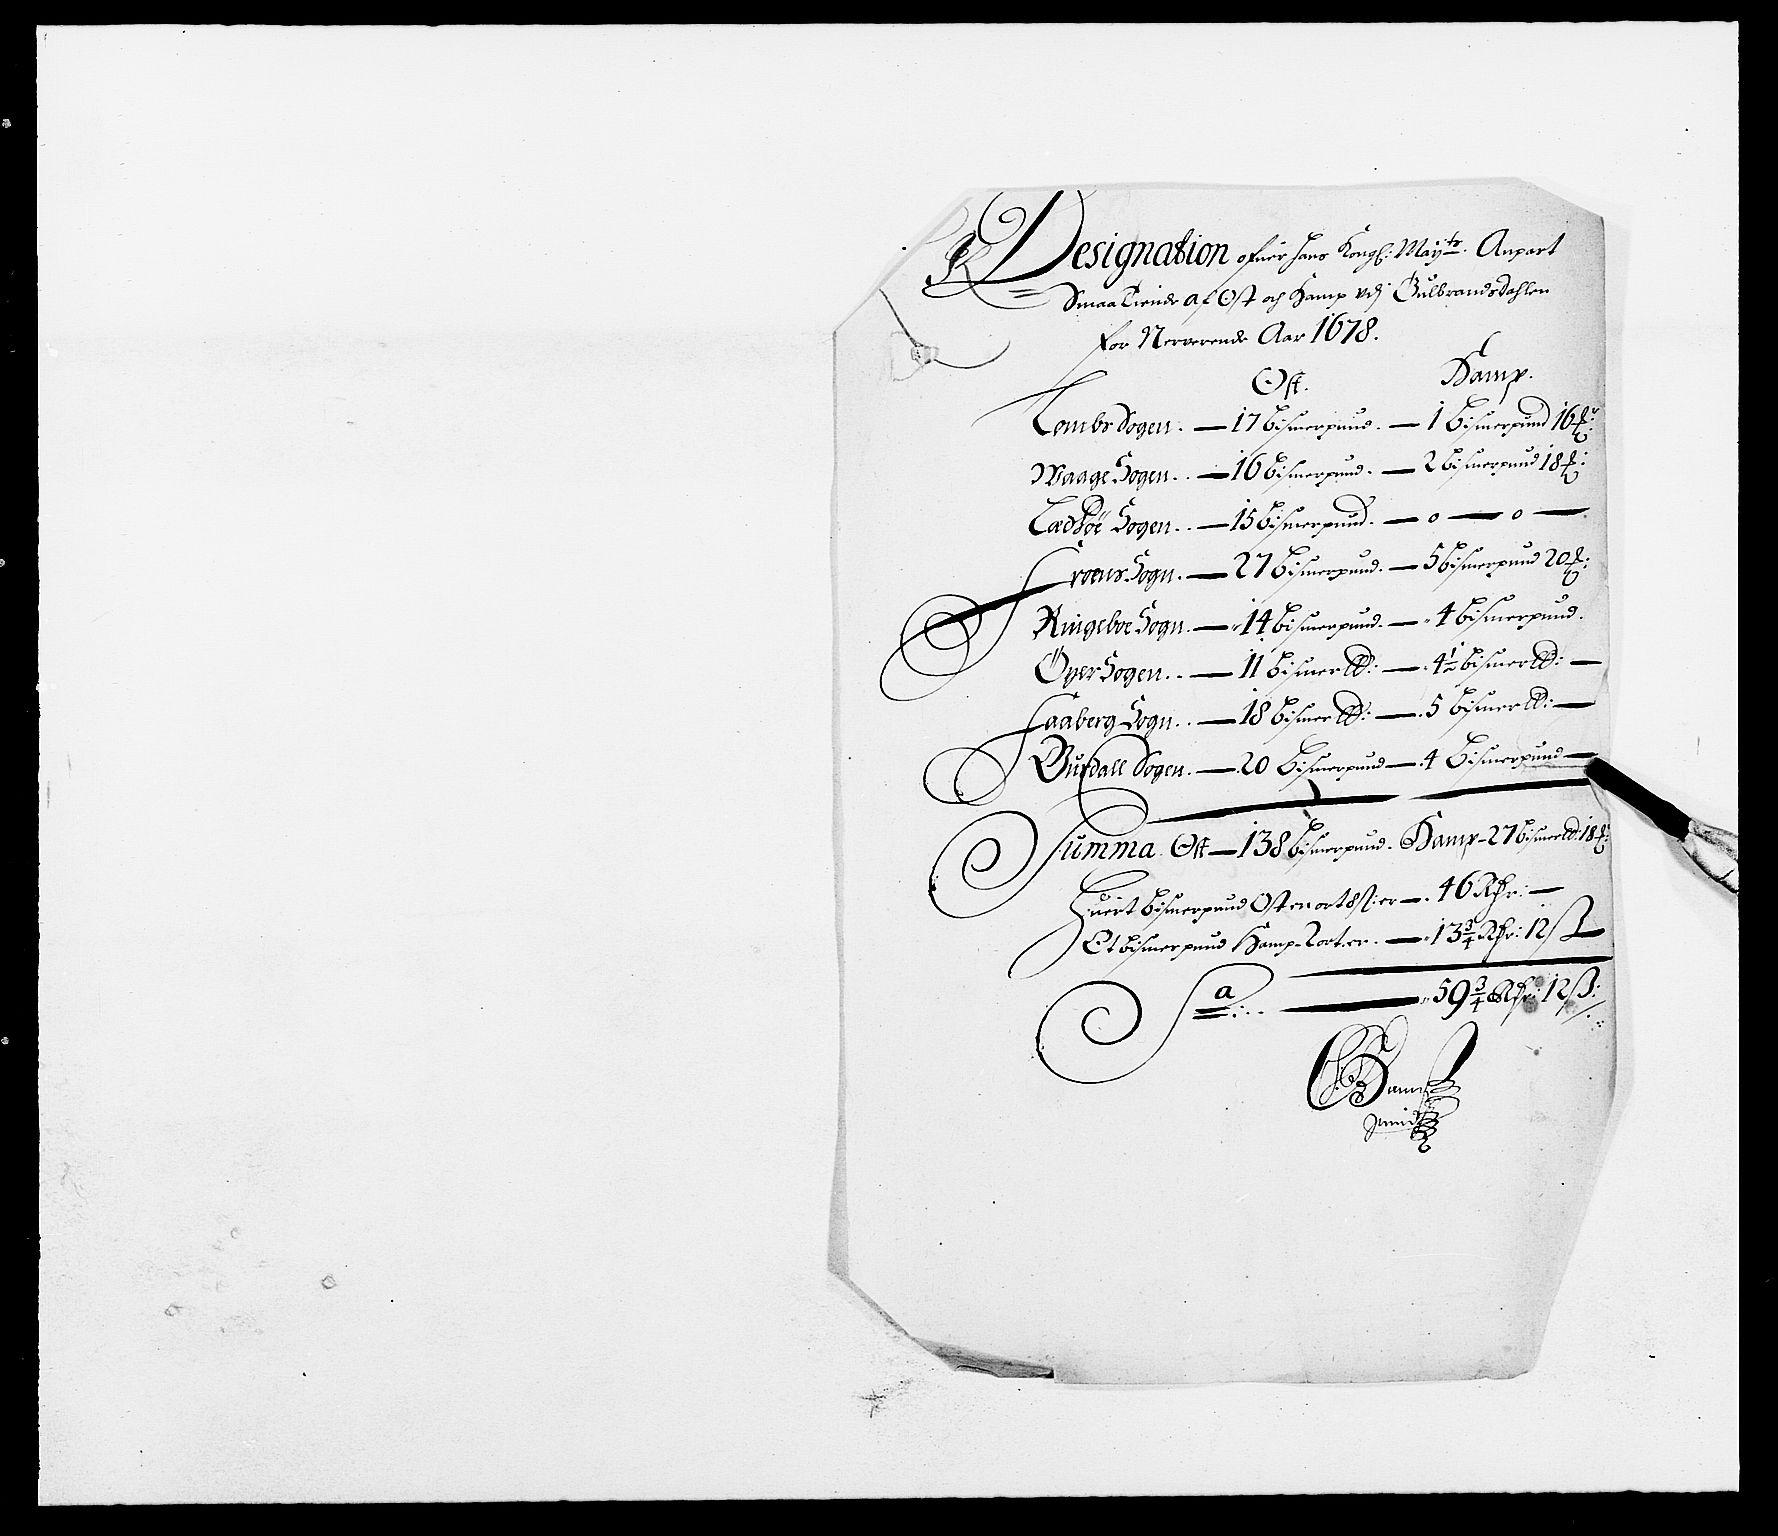 RA, Rentekammeret inntil 1814, Reviderte regnskaper, Fogderegnskap, R17/L1152: Fogderegnskap Gudbrandsdal, 1678-1679, s. 374